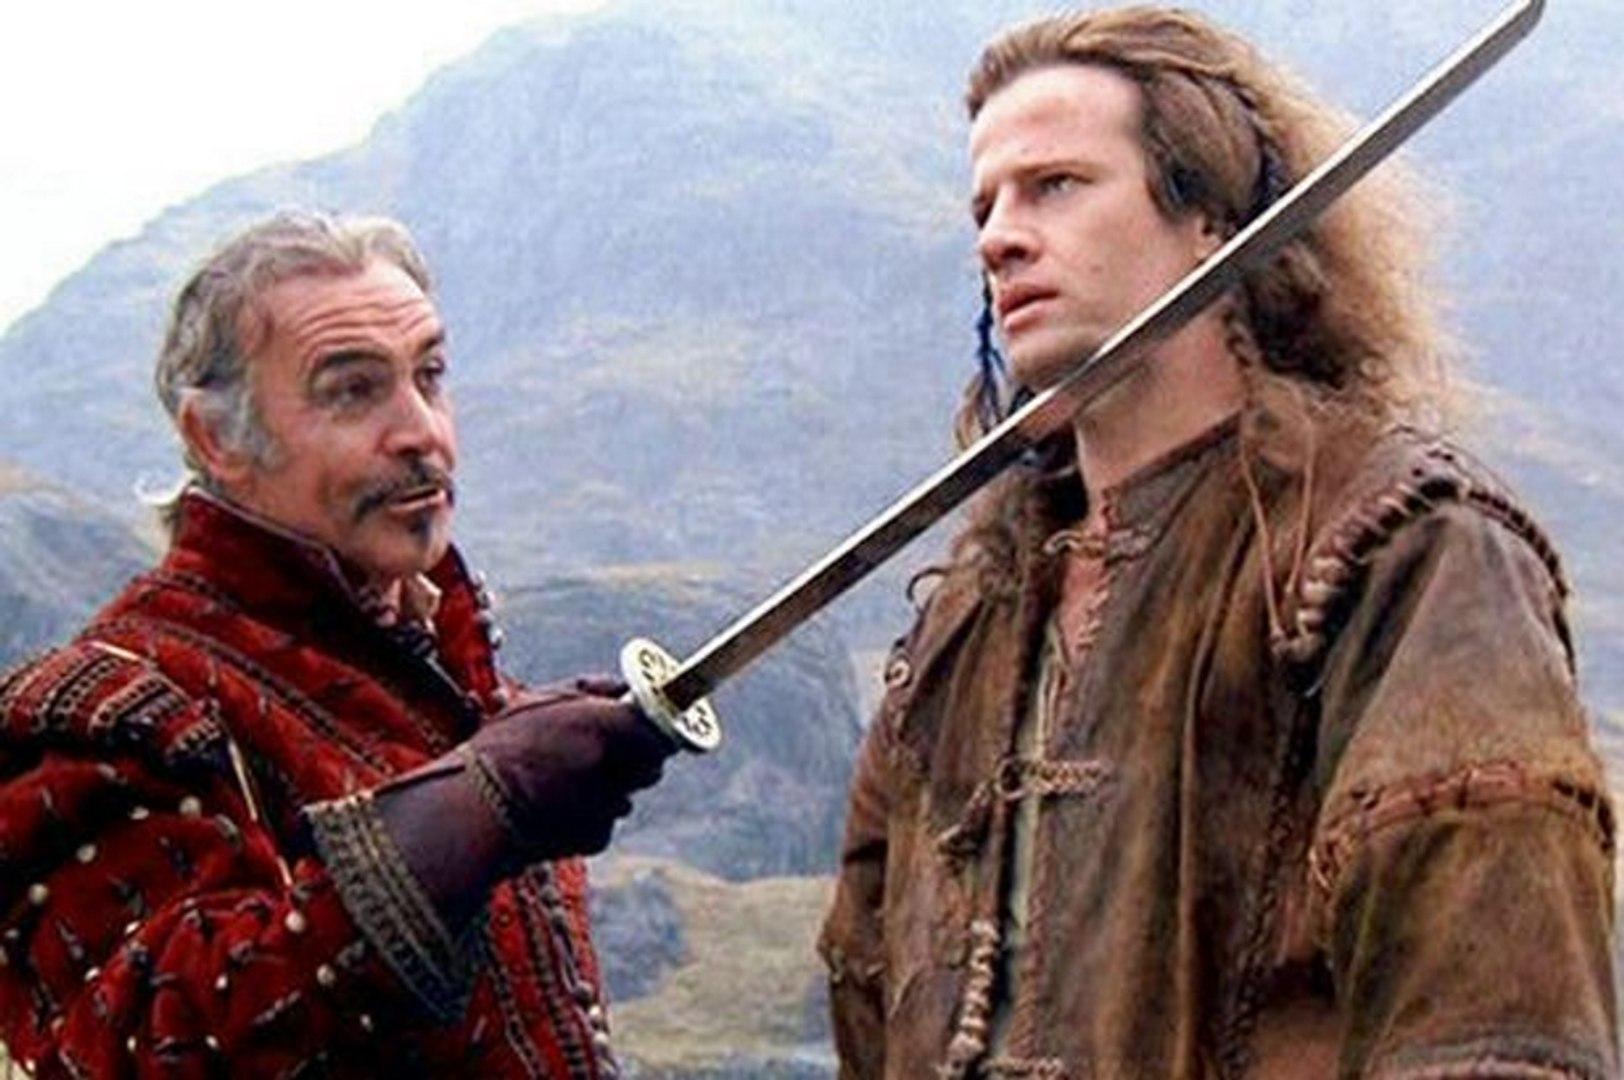 Highlander Film (1986) avec Christophe Lambert et Sean Connery - Vidéo  Dailymotion